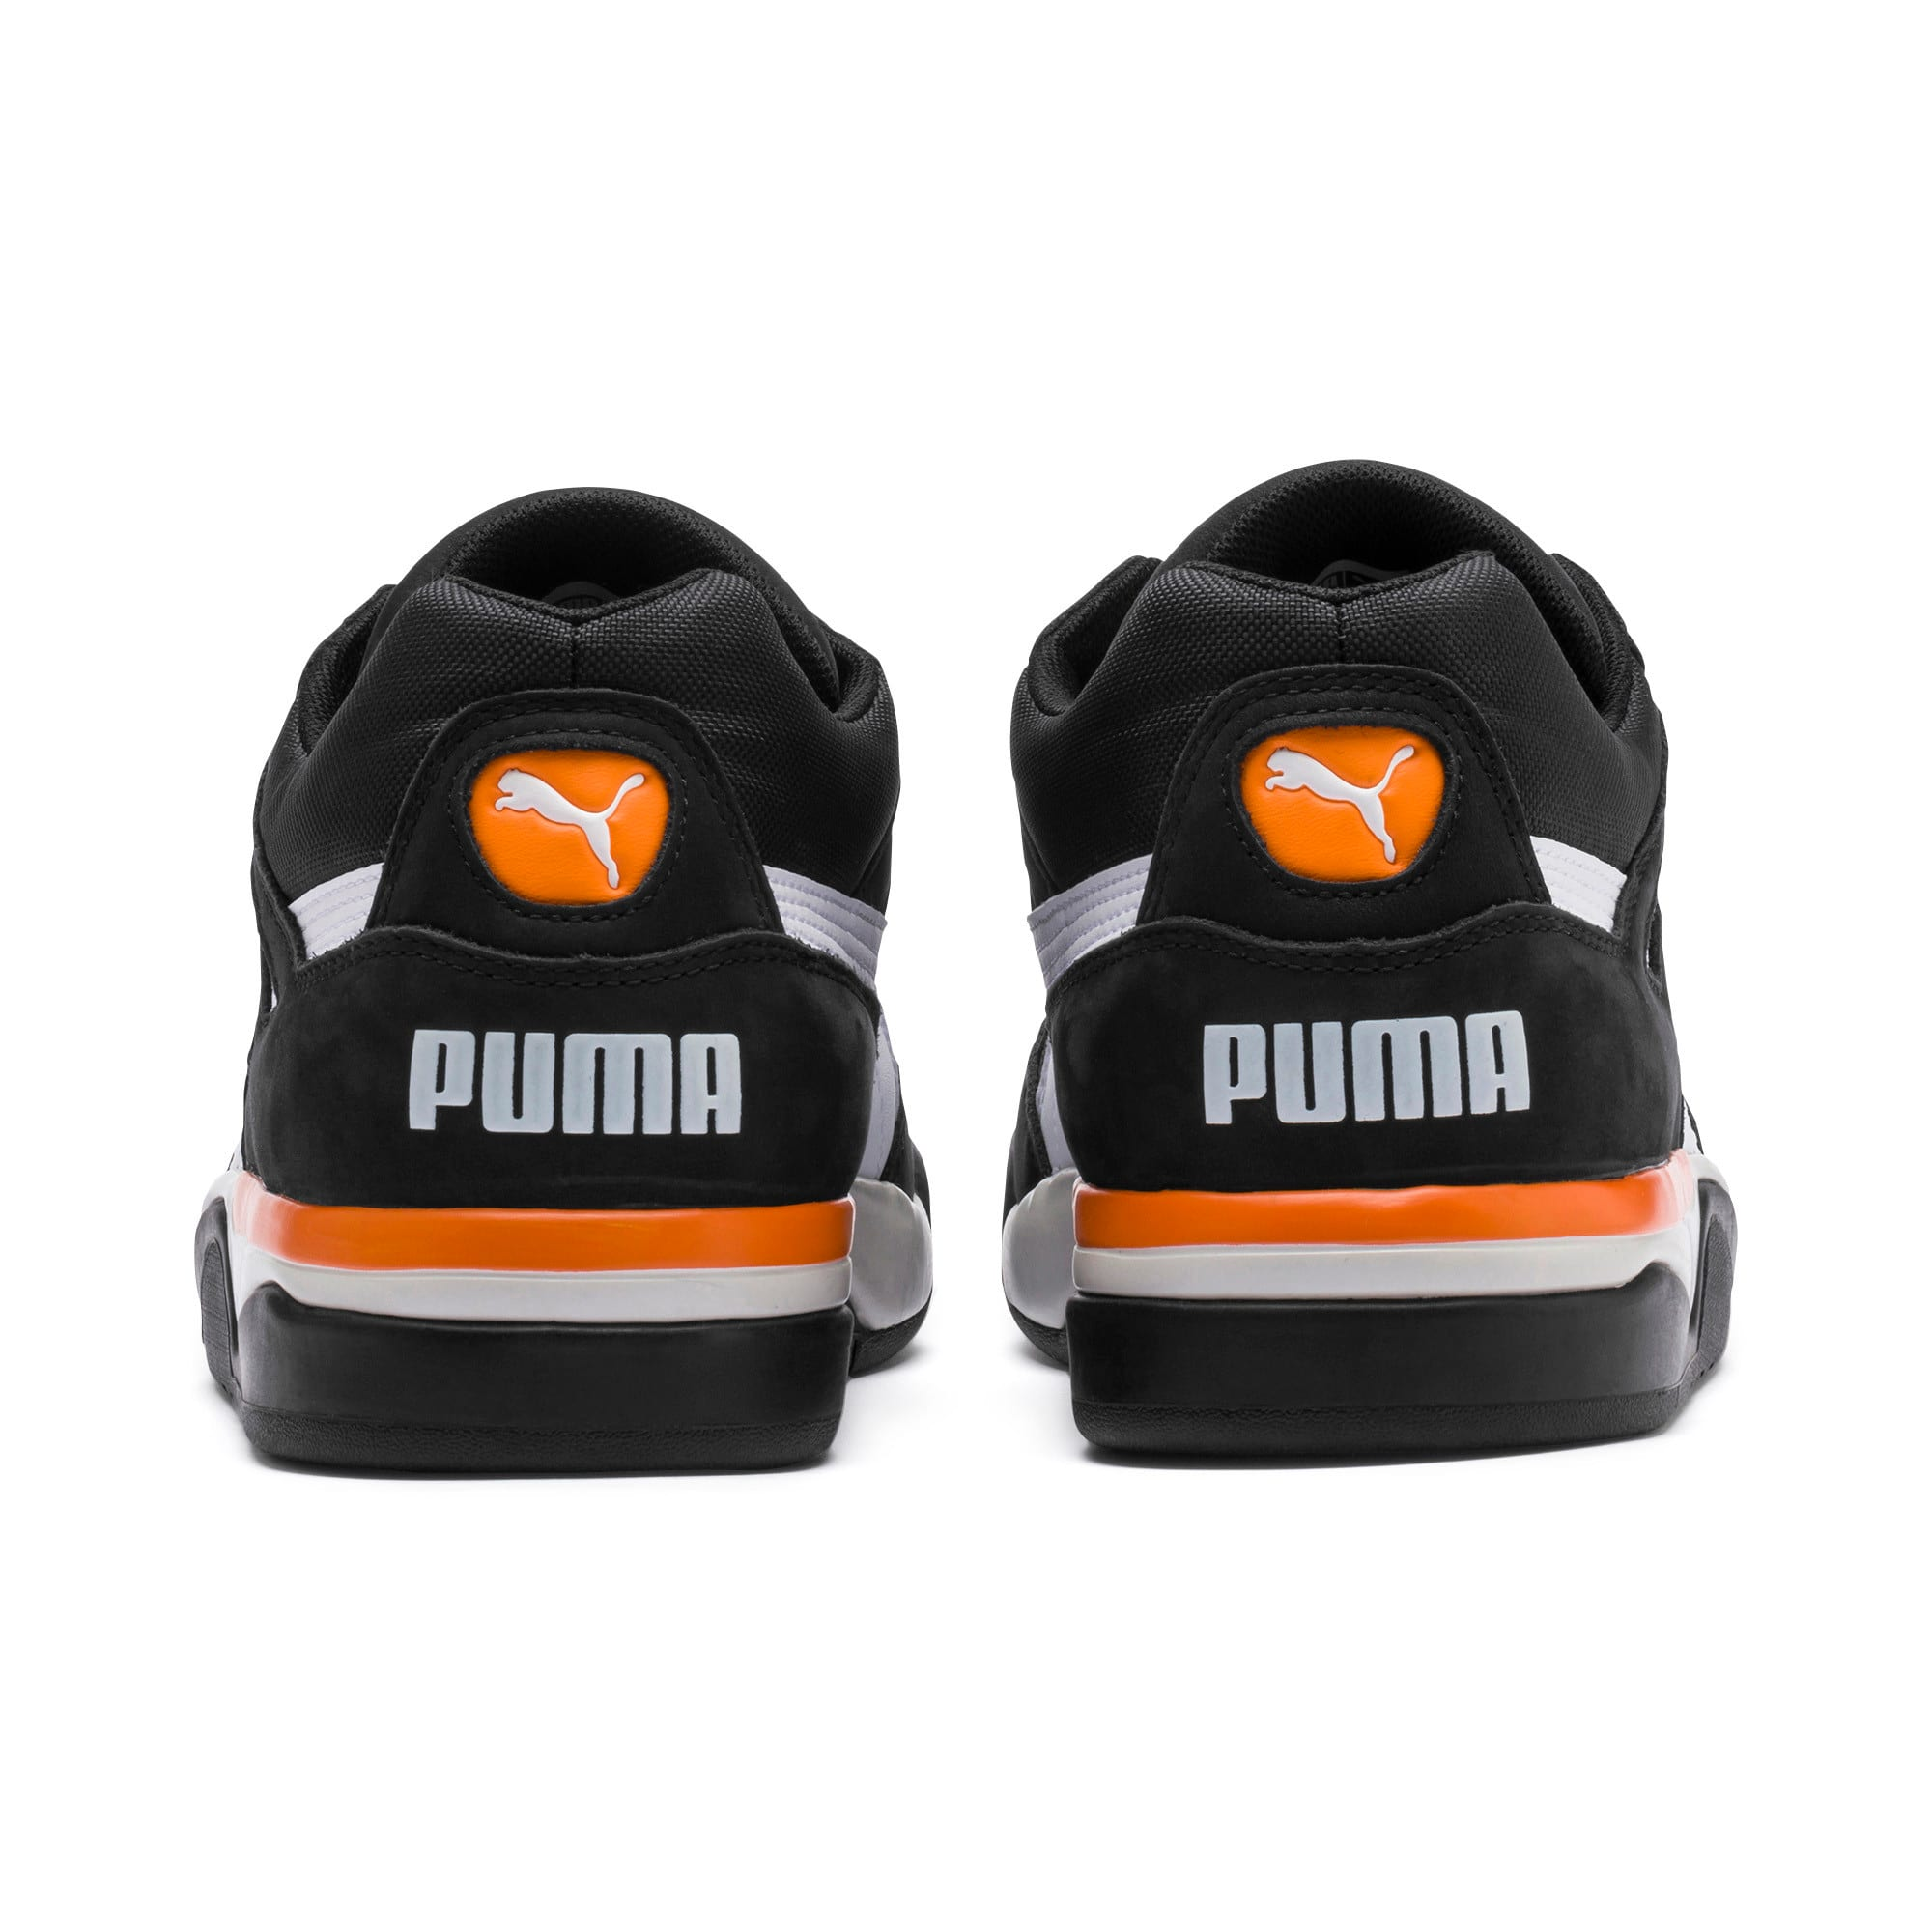 Thumbnail 3 of Palace Guard Bad Boys Trainers, Puma Black-Puma White-, medium